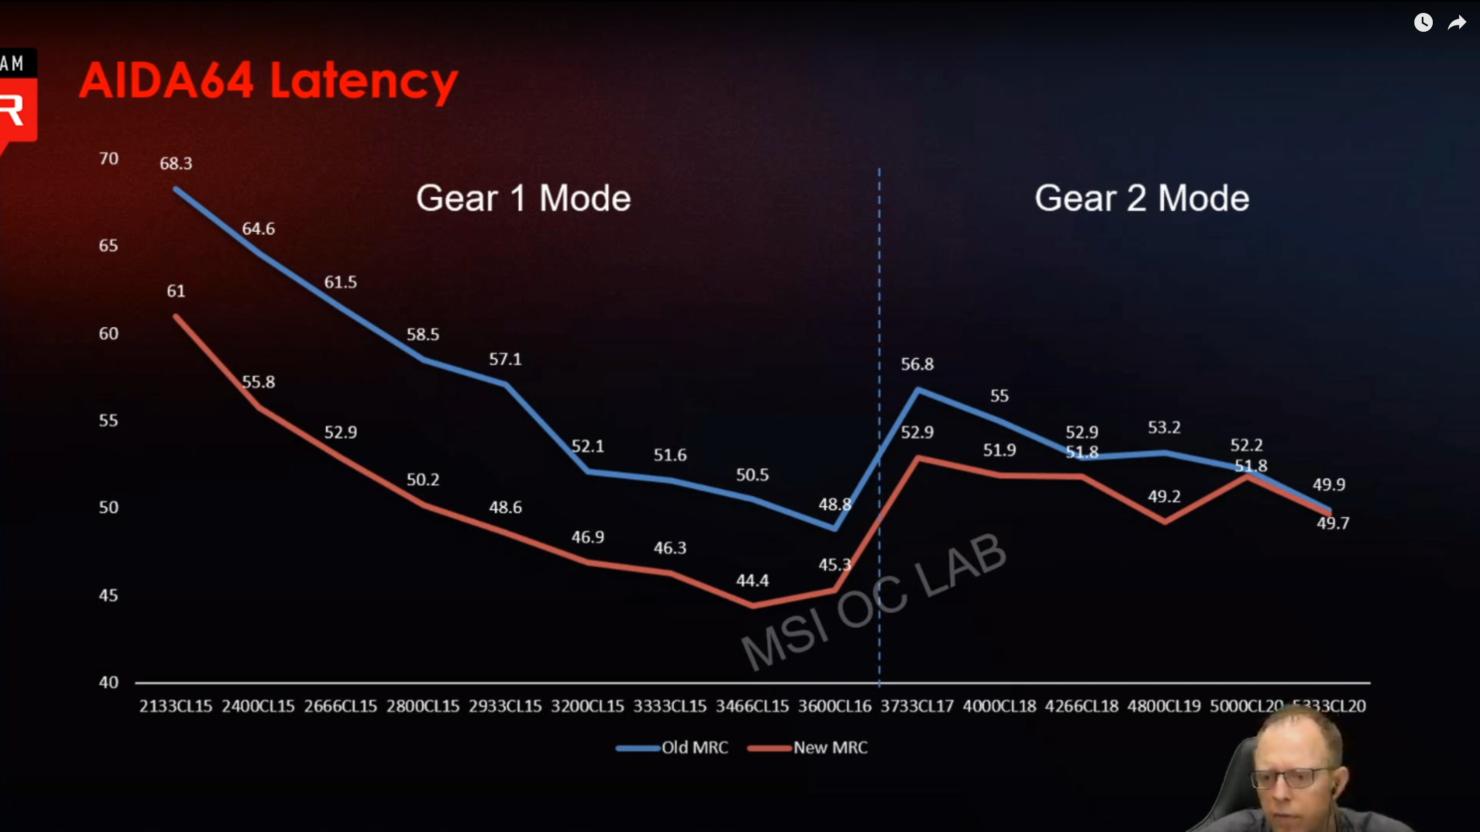 msi-intel-11th-gen-rocket-lake-desktop-cpu-overclocking-power-limits-temperatures-adaptive-boost-technology-gear-modes-detailed-_12